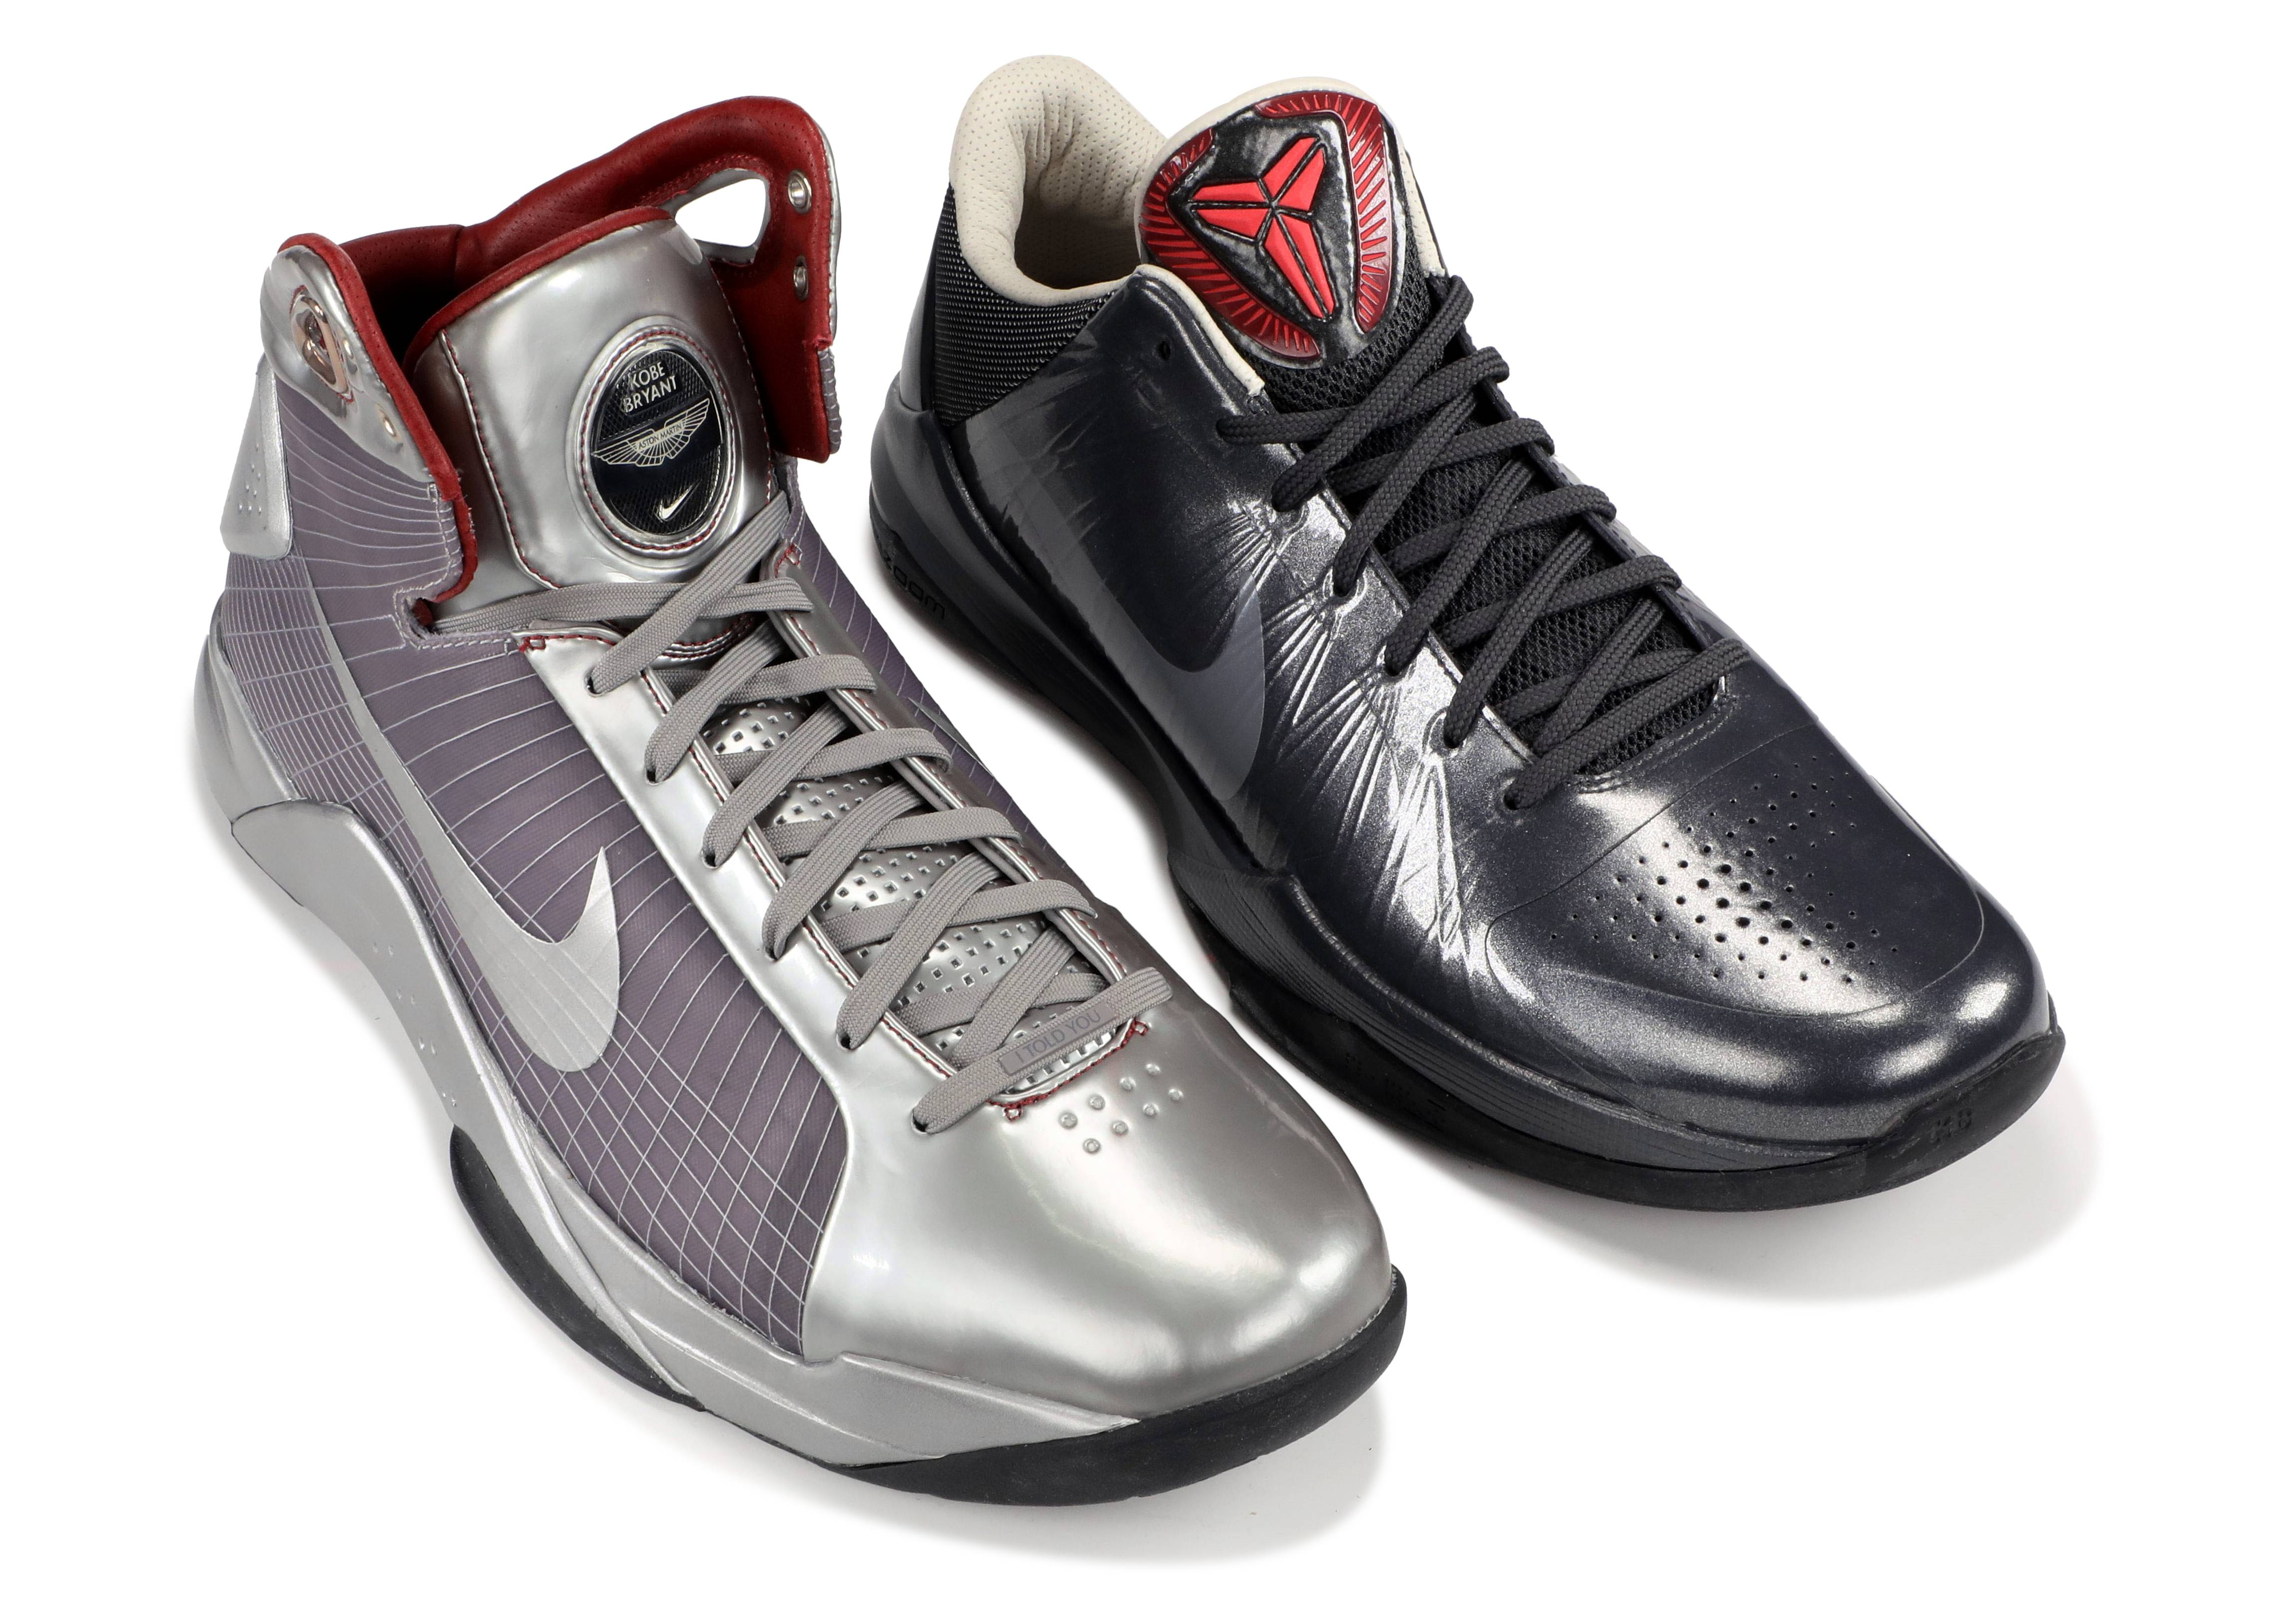 Kobe Aston Martin Pack Nike 402638 001 Anthrct Blk Sl Aston Martin Flight Club